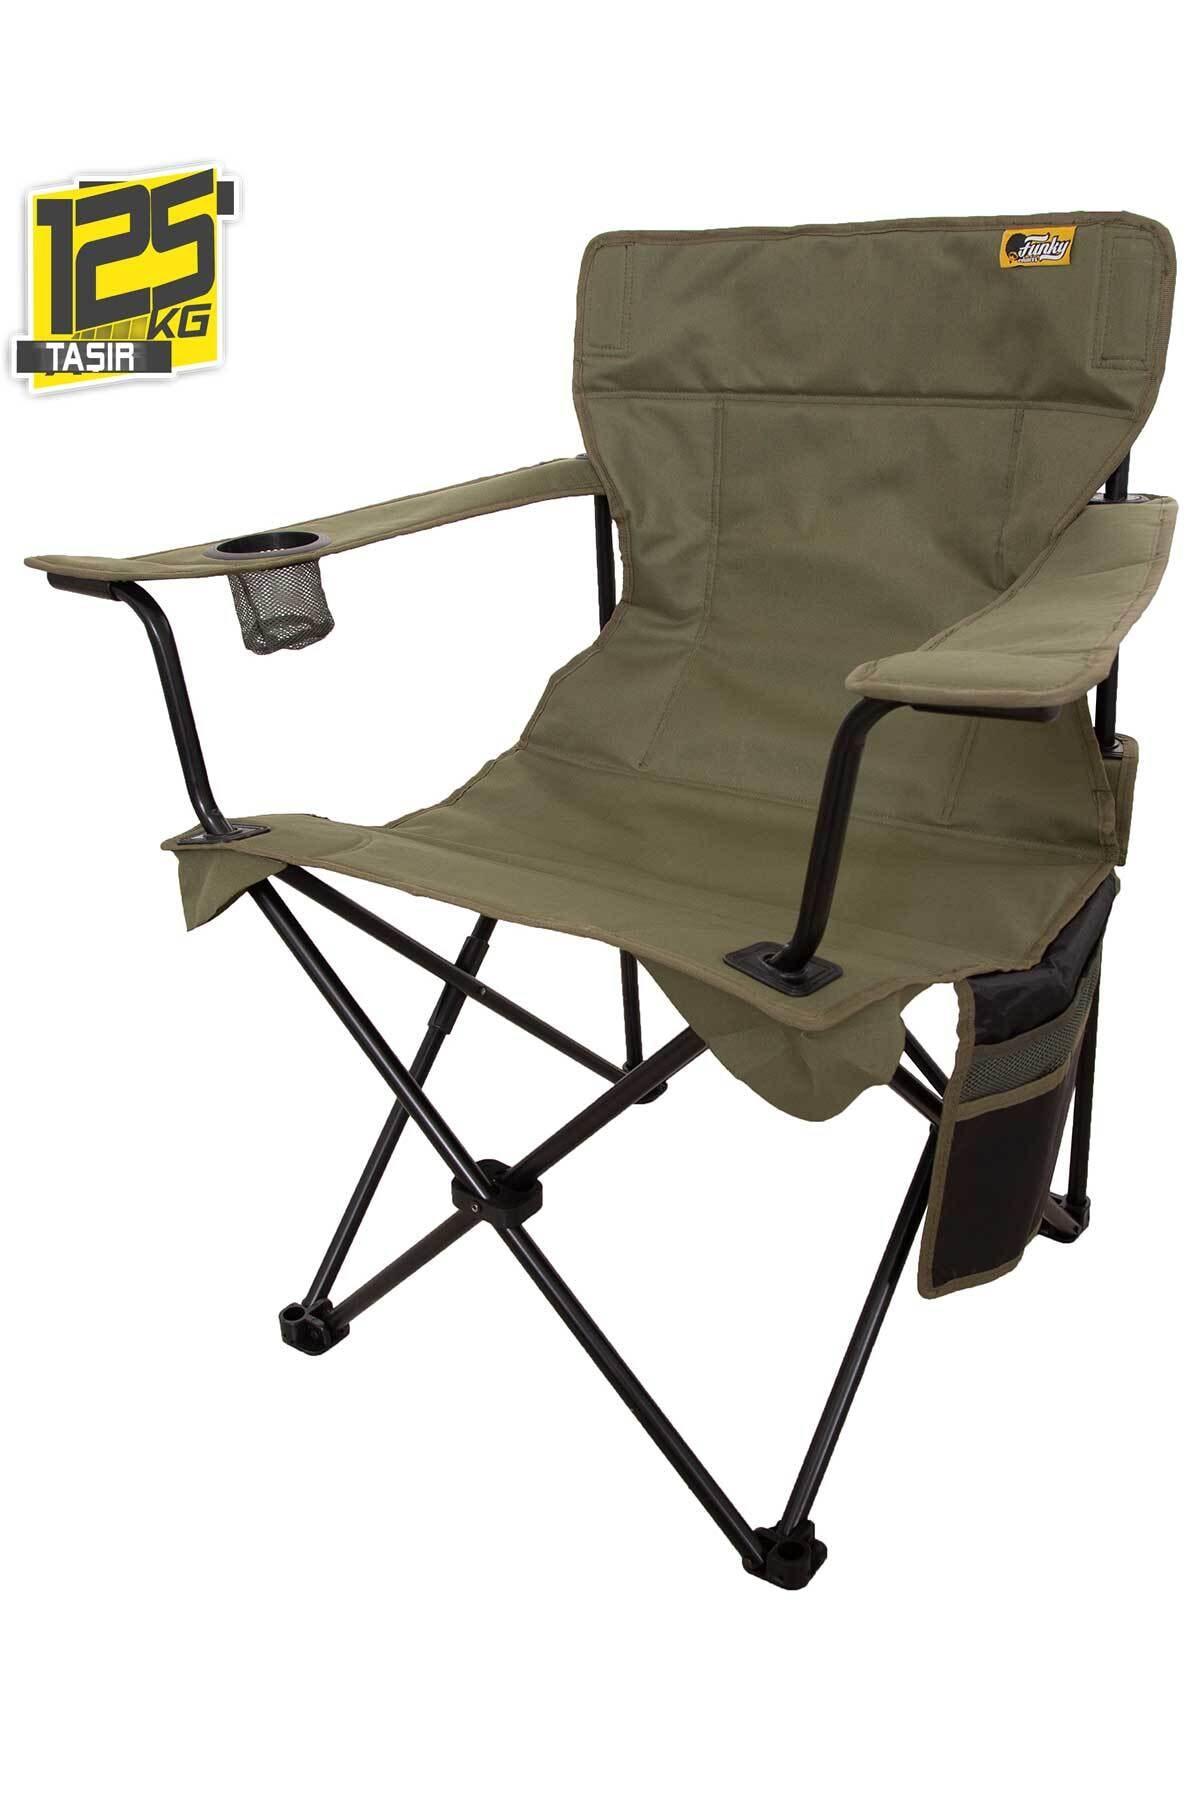 Funky Chaırs V2 Haki Lüks Kamp Sandalyesi